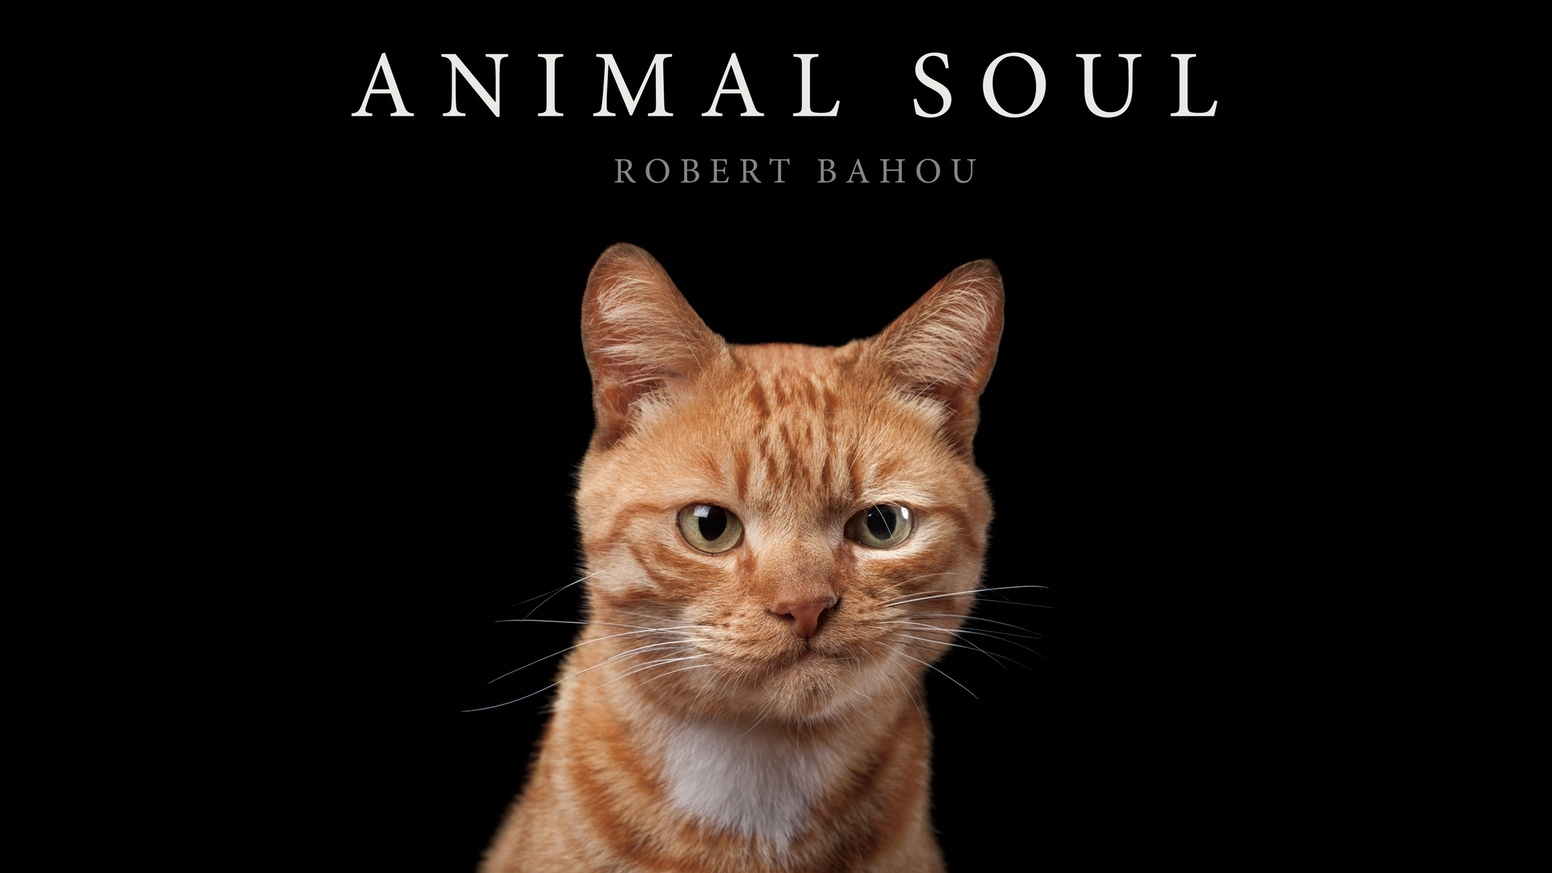 AnimalSoul.jpg